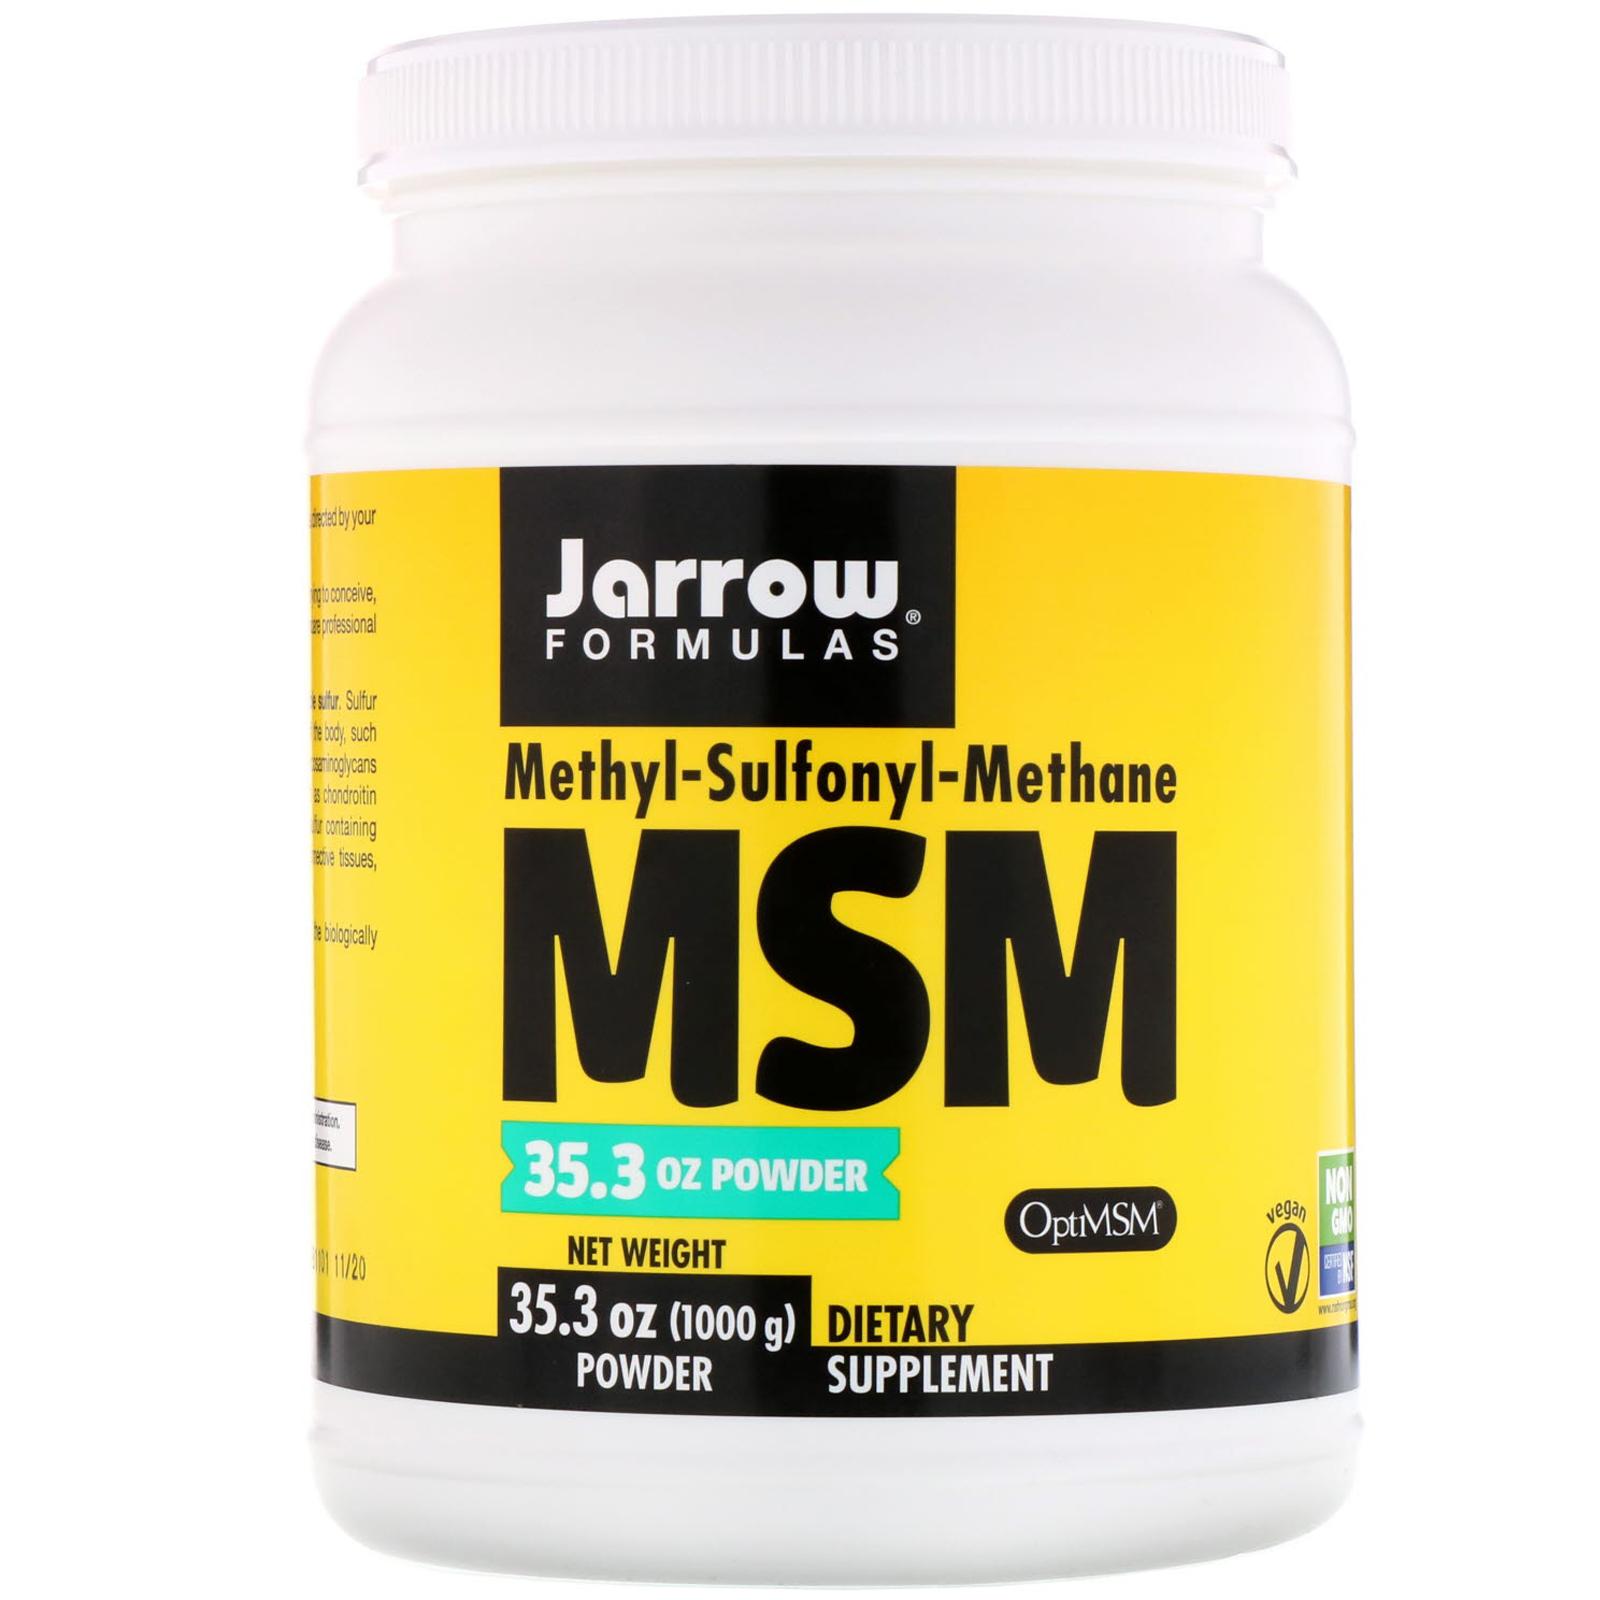 Jarrow Formulas, MSM Powder, 2 2 lbs (1000 g) - iHerb com